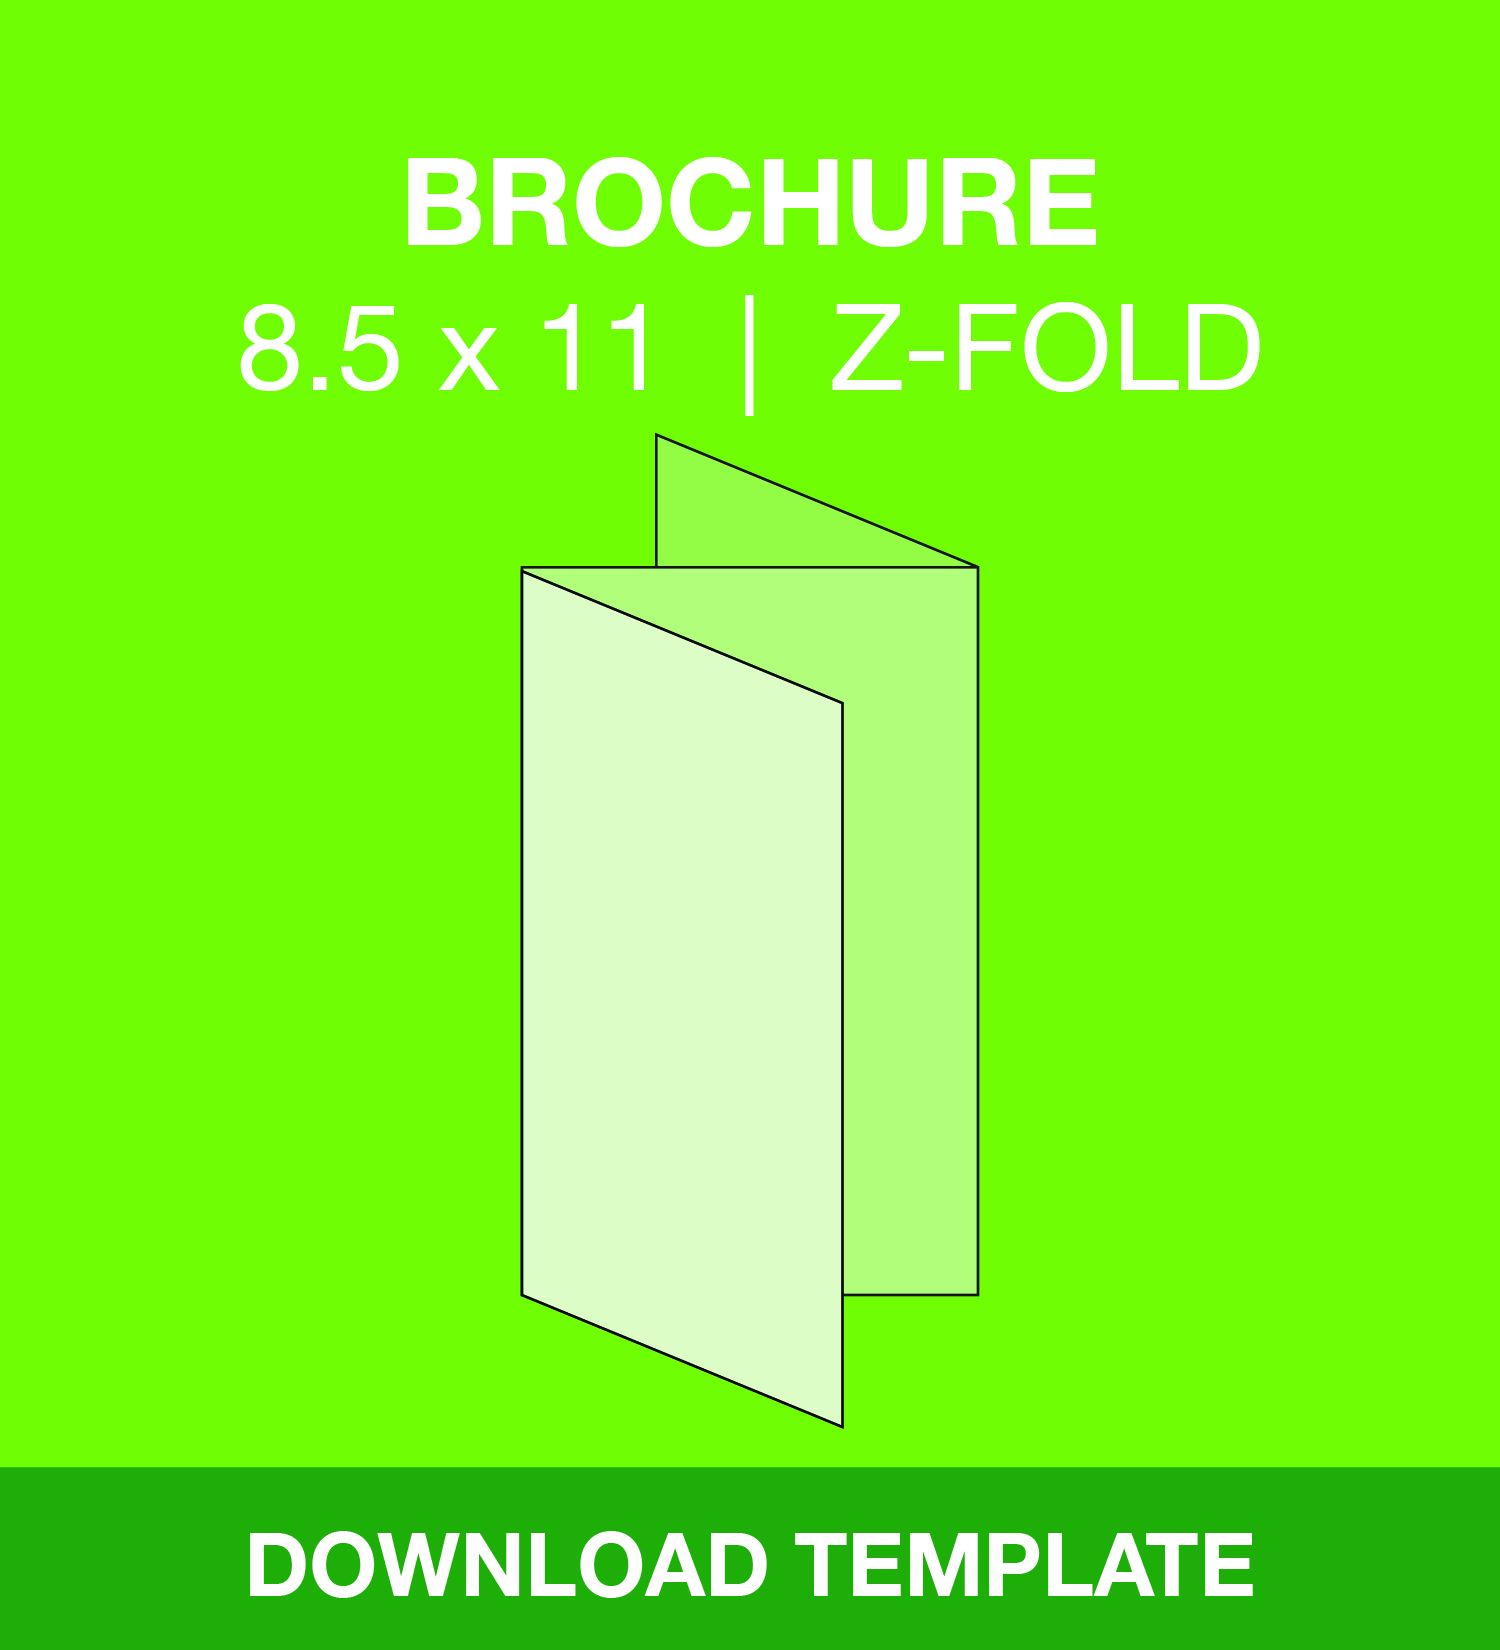 Brochure z fold